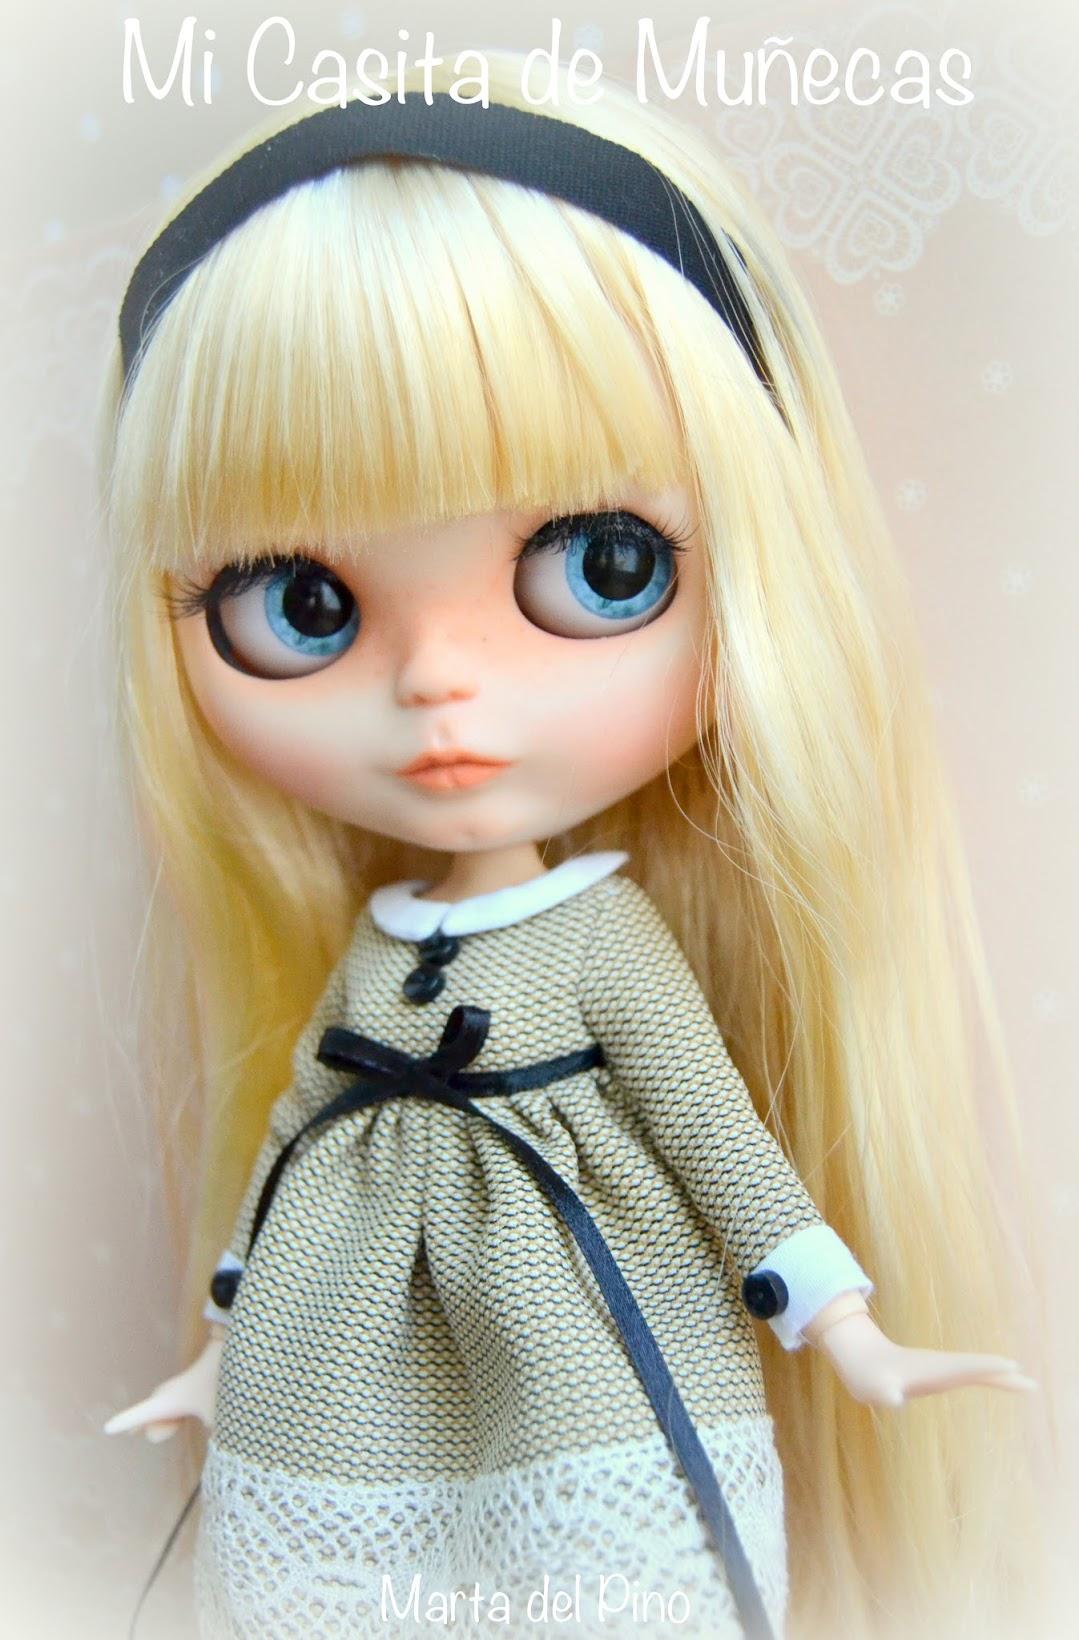 blythe custom, mi casitas de muñecas, Marta del Pino, dolls, blythe, customizar, chips,